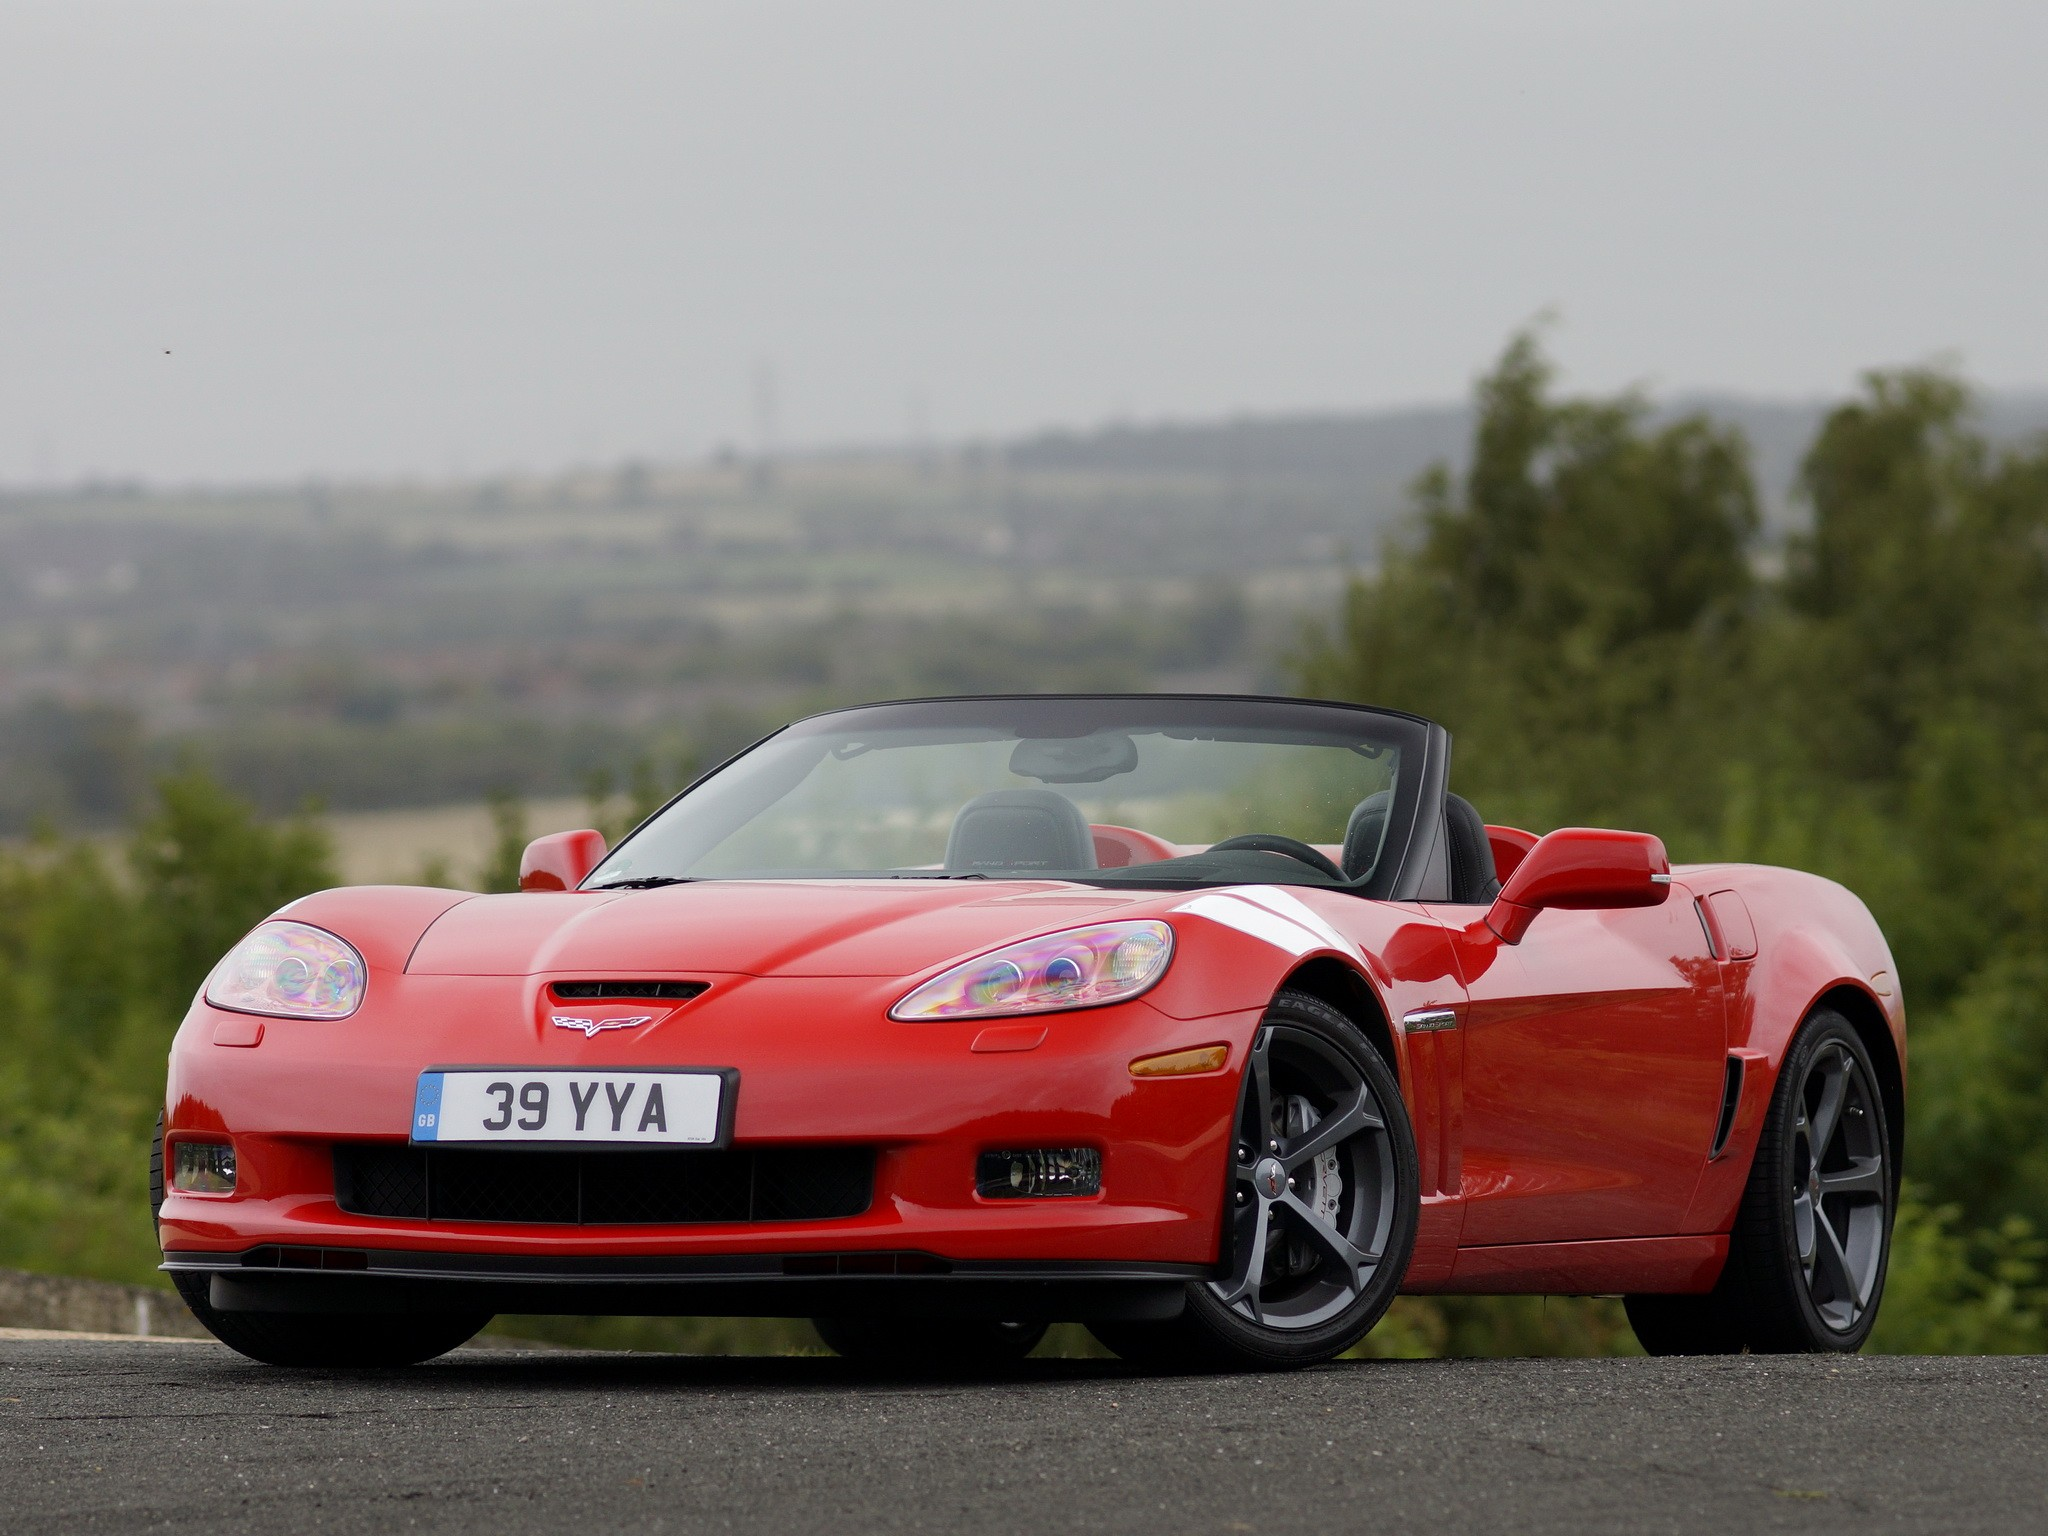 National Corvette Museum >> CHEVROLET Corvette Convertible Grand Sport specs - 2009, 2010, 2011, 2012, 2013 - autoevolution